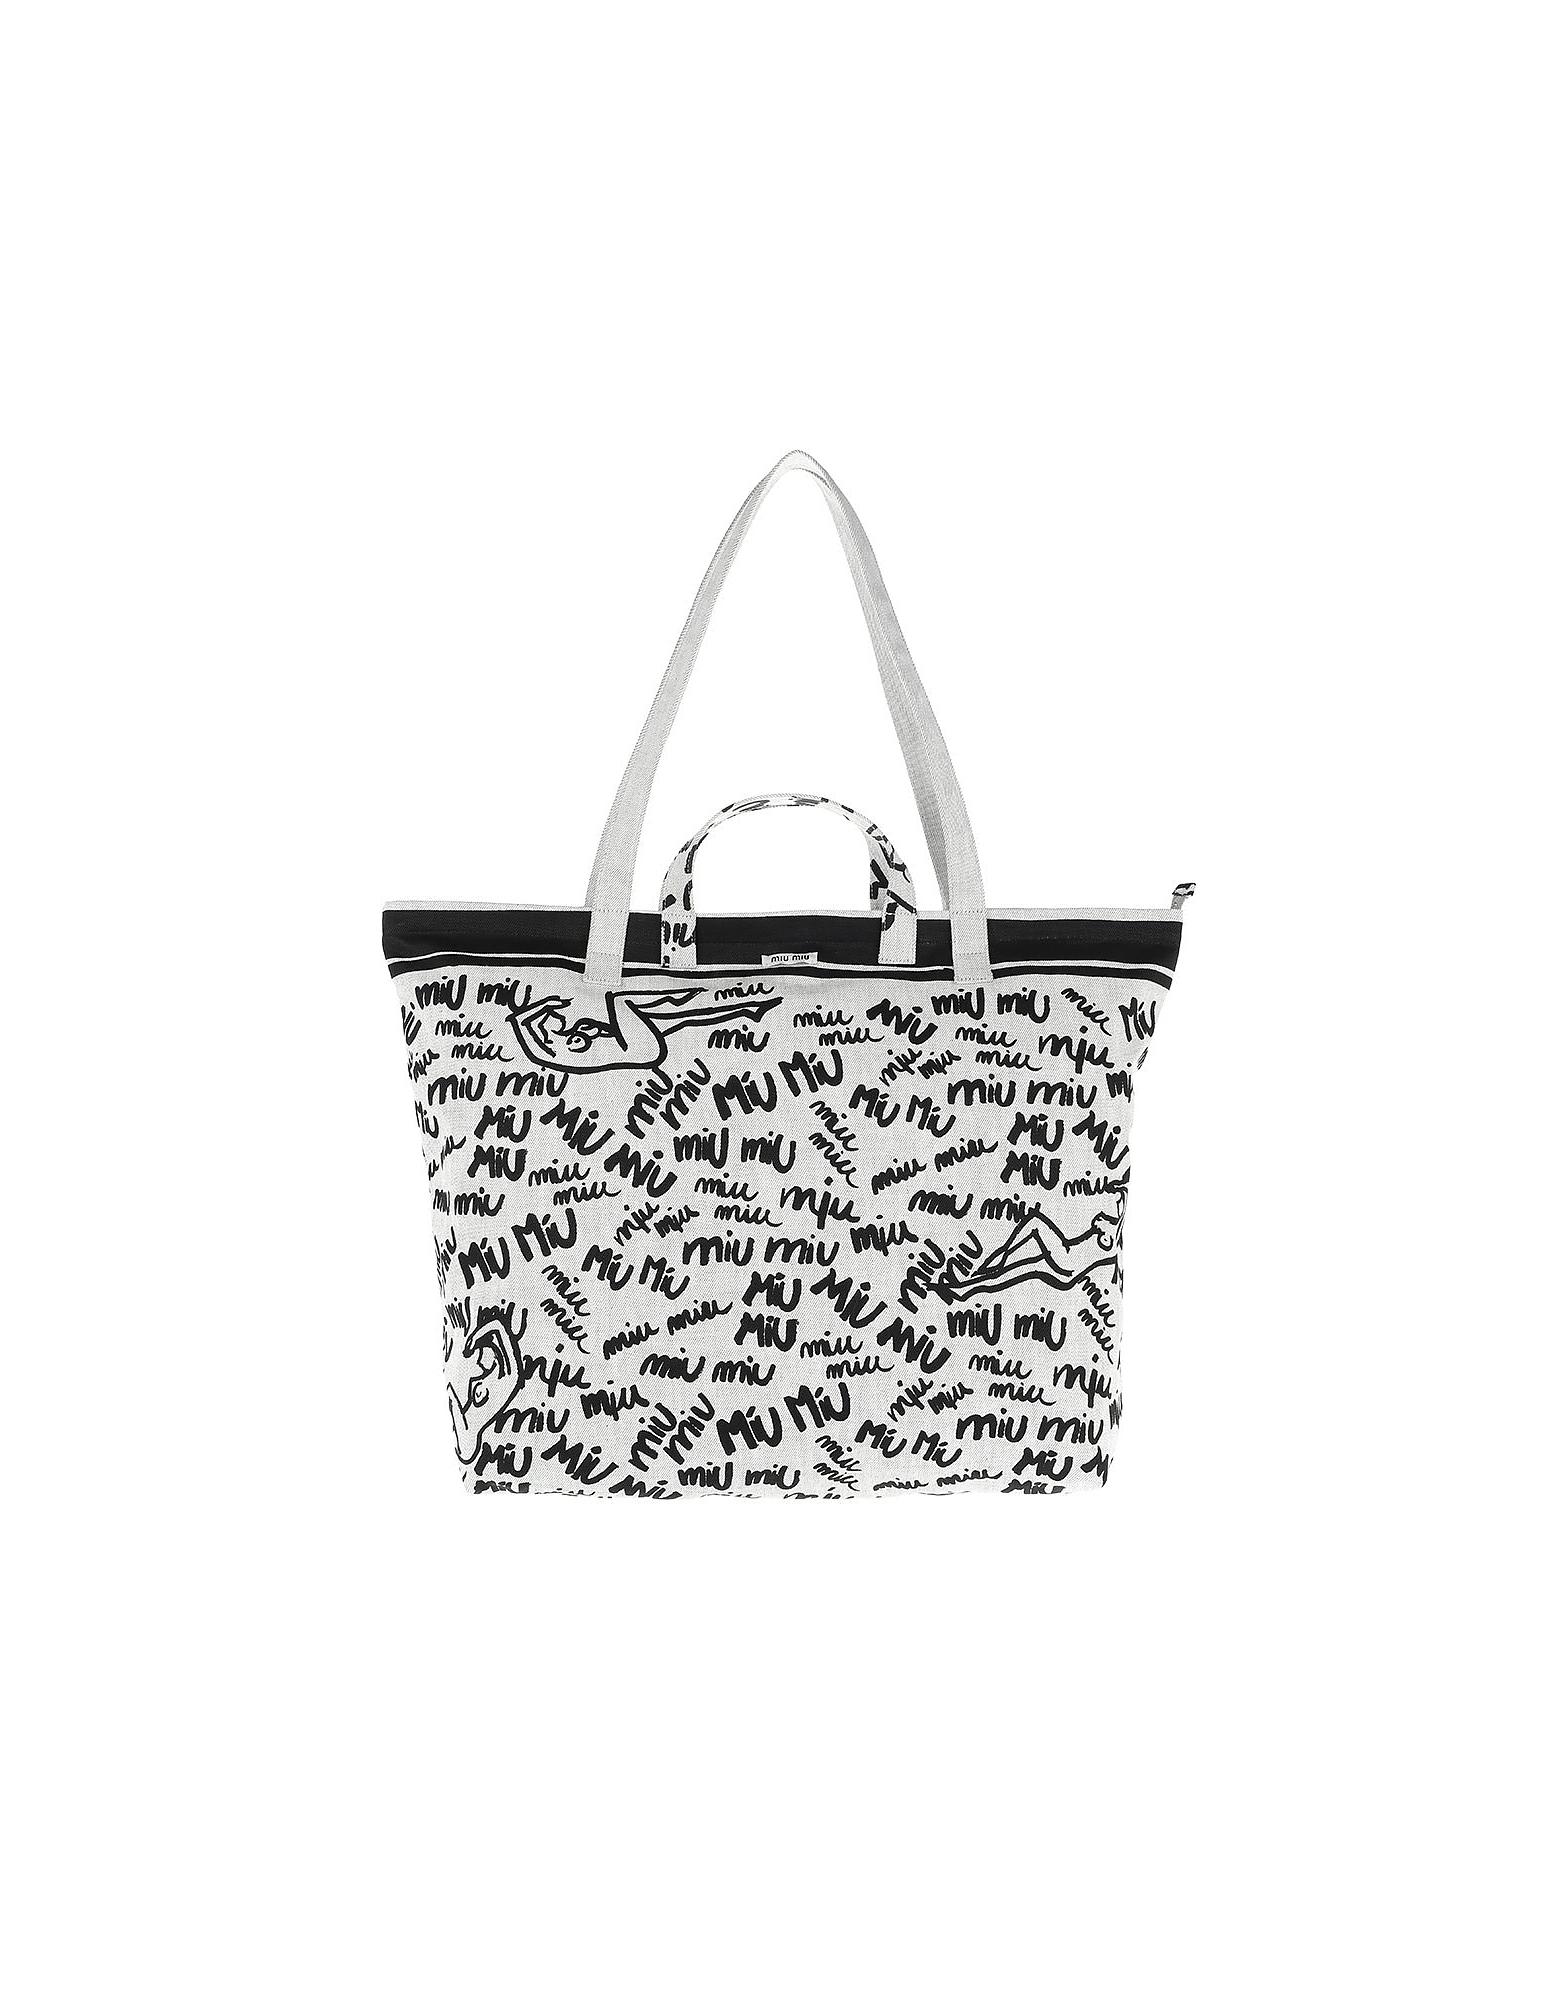 Miu Miu Handbags, Shopping Bag Print Canvas White